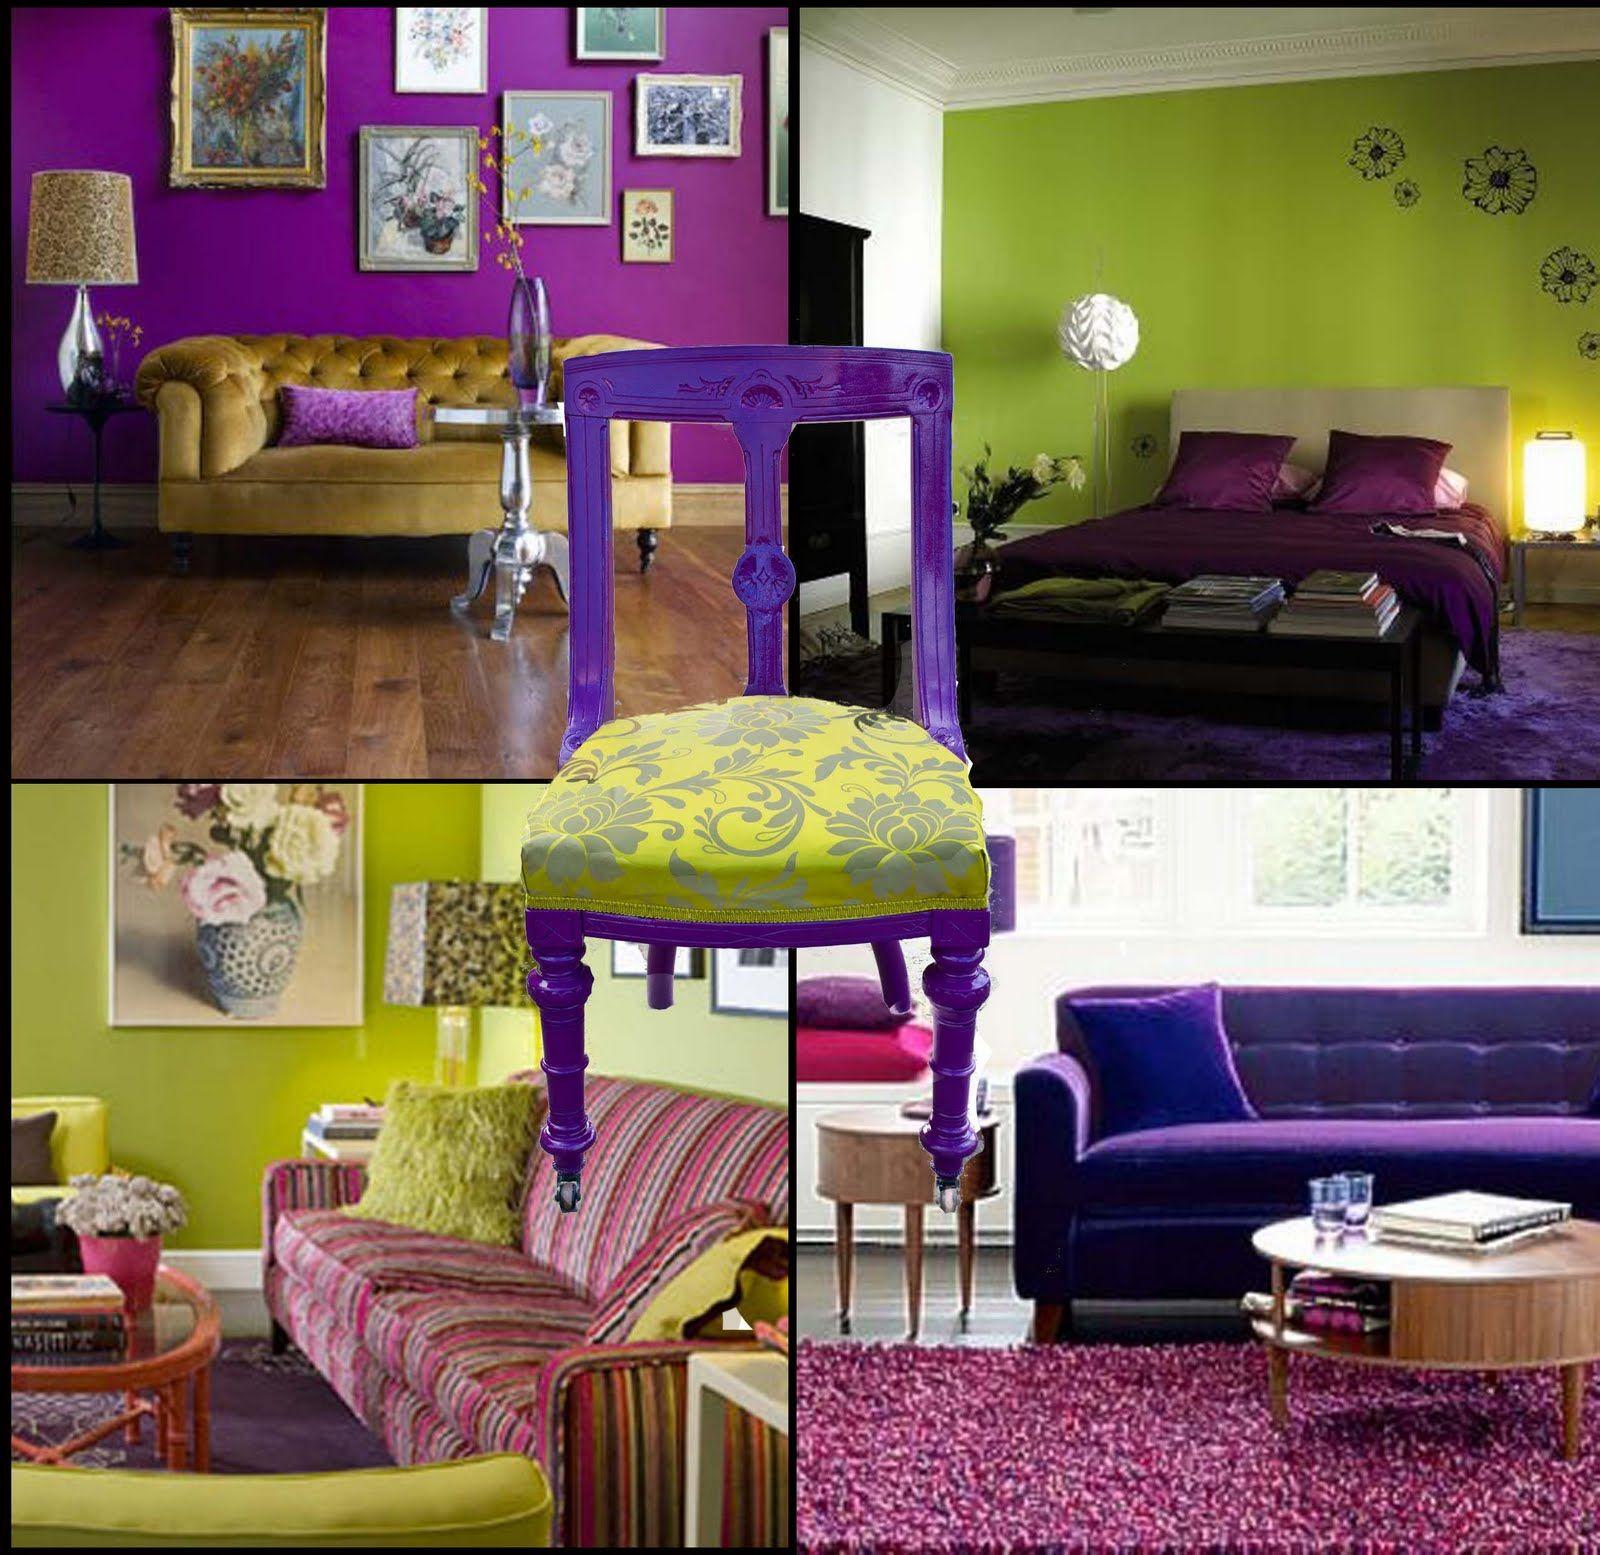 Room Decor Purple And Green Living Room Ideas Novocom Top